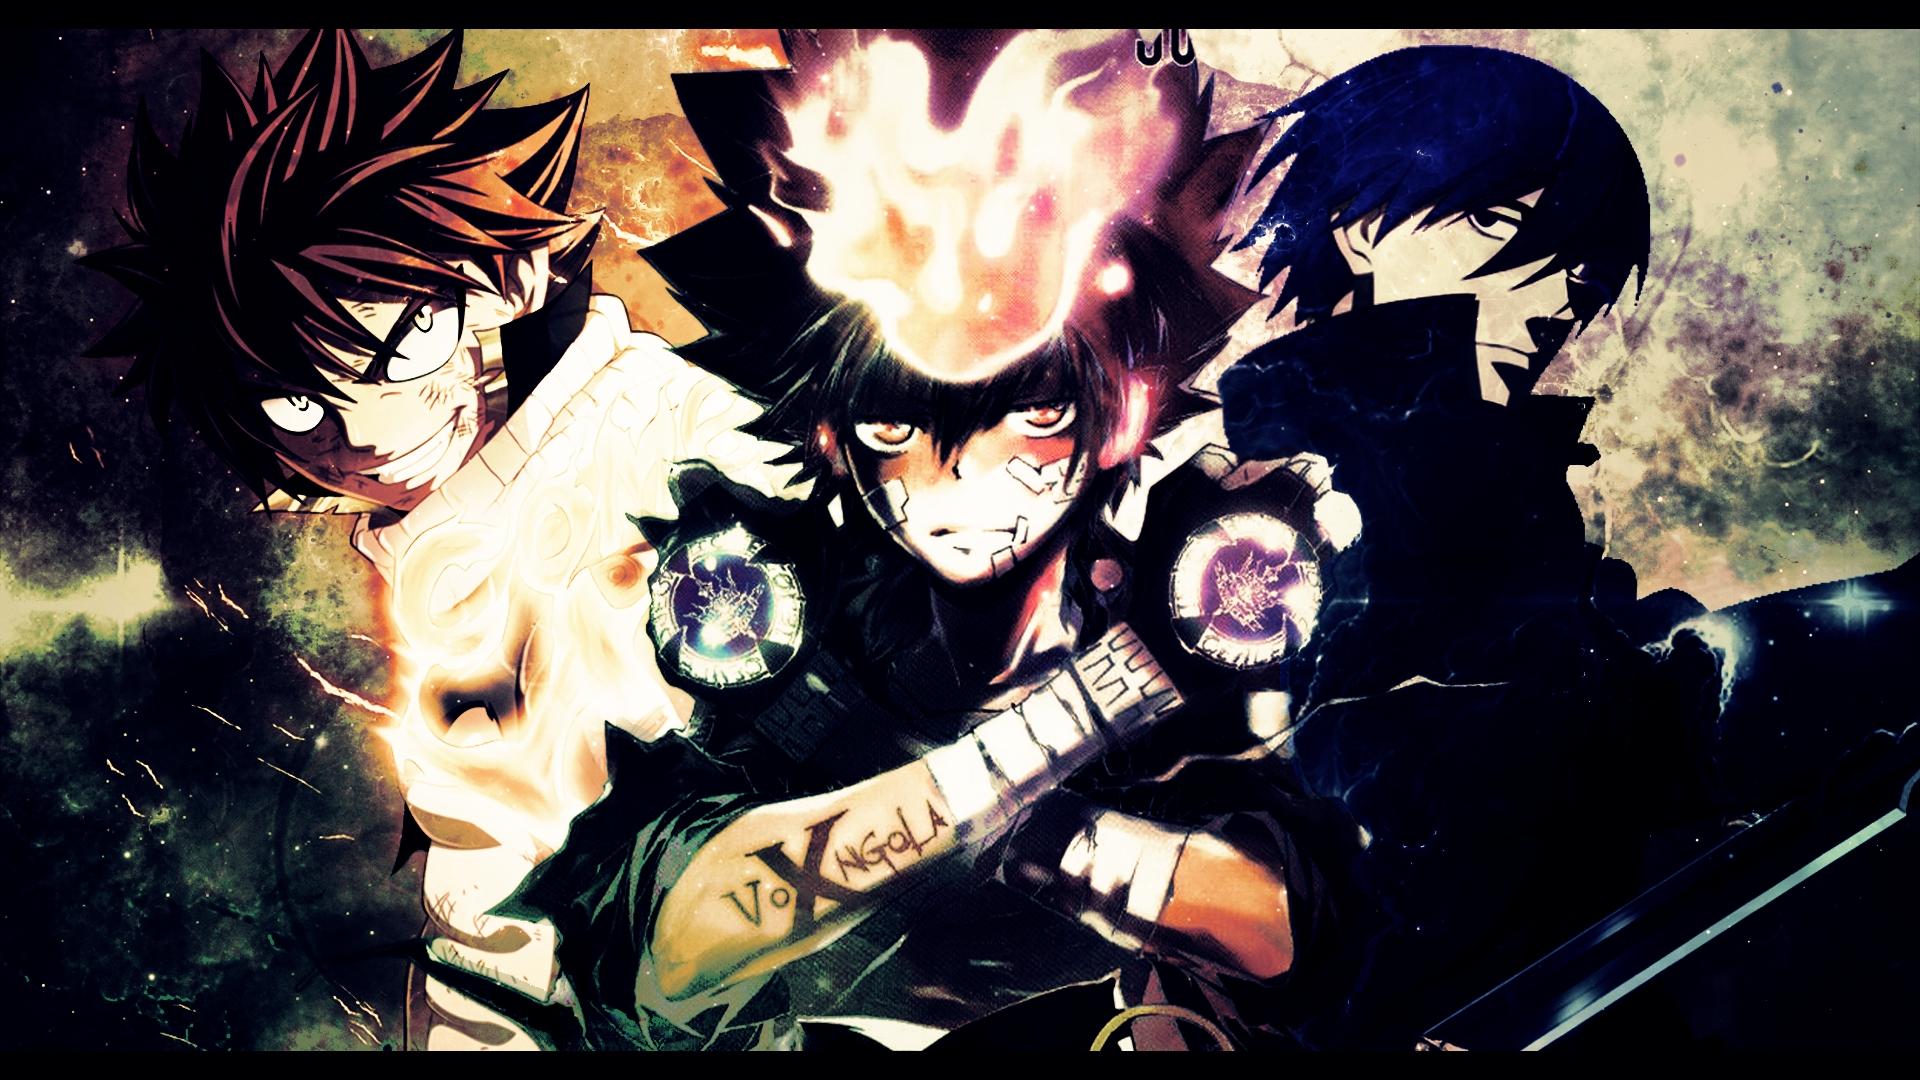 hd-anime-wallpaper-free-download-from-wallpaperzet | erwintalisic